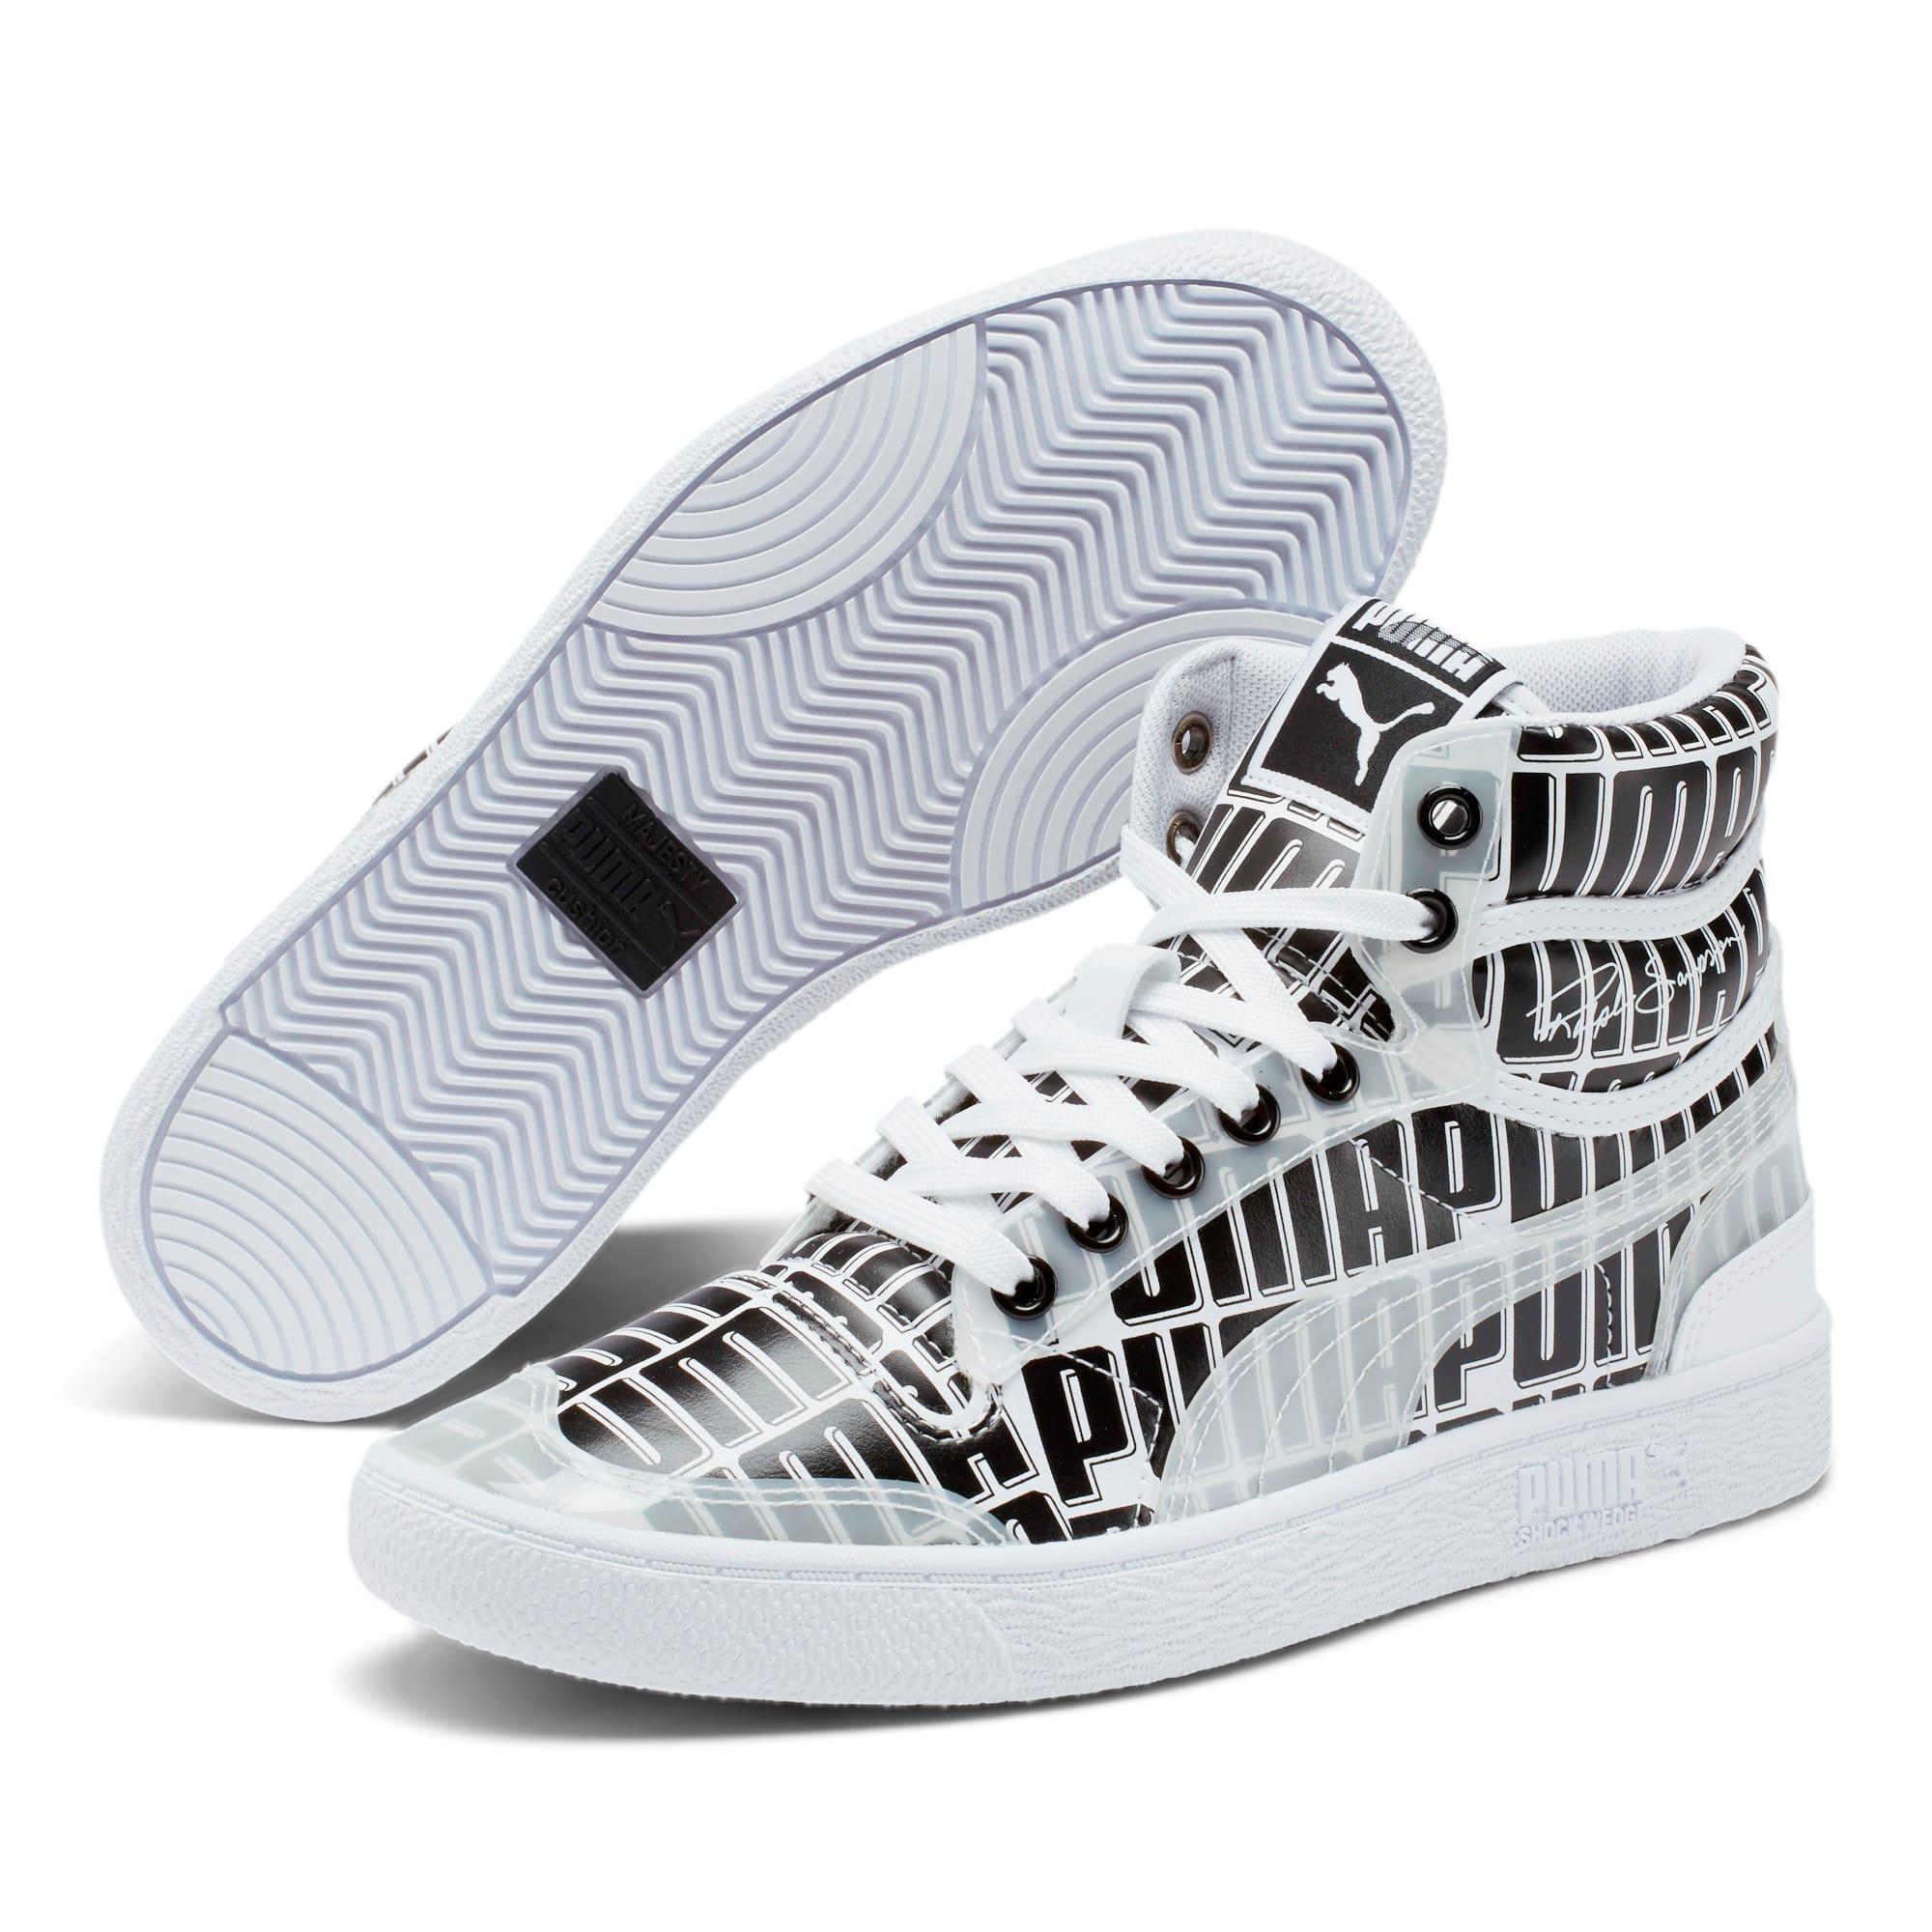 Thumbnail 2 of Ralph Sampson Mid Logo Women's Sneakers, Puma White-Puma Black, medium